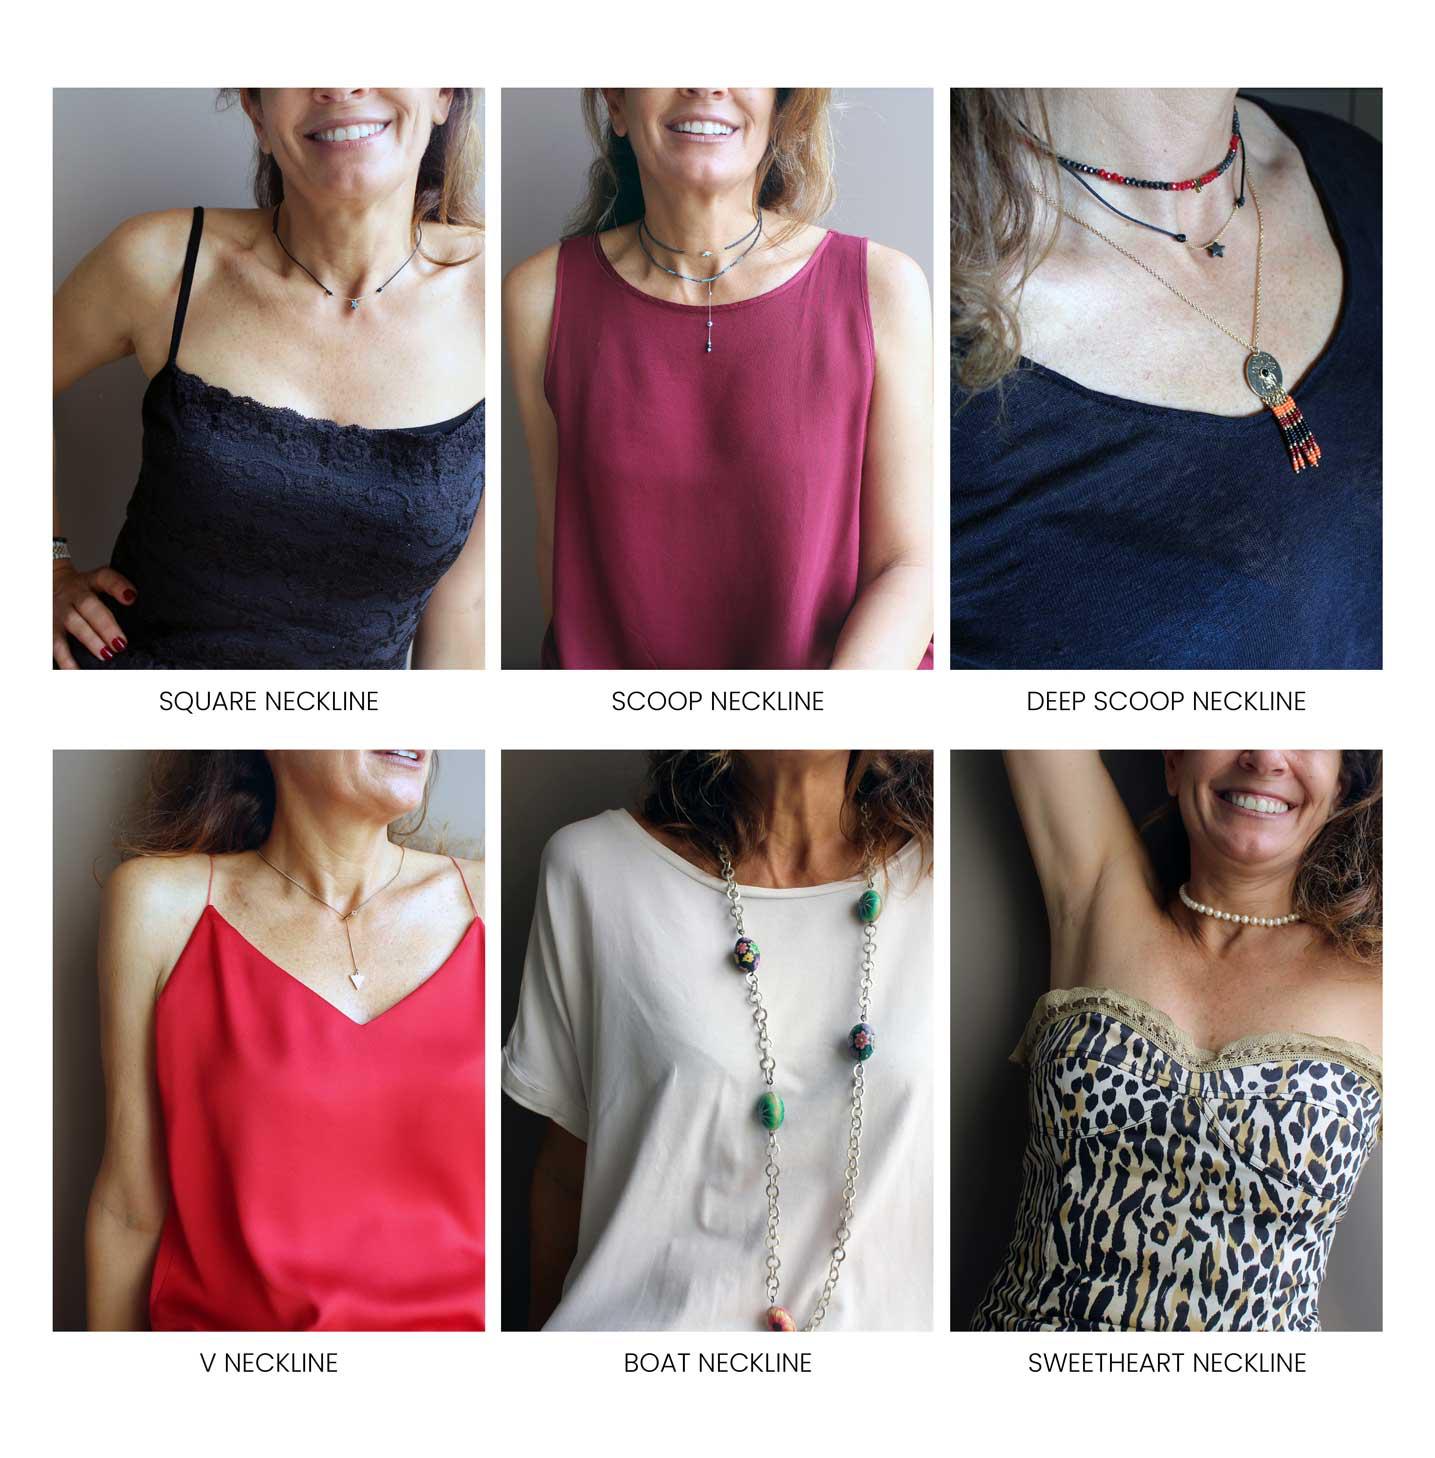 Square neckline, scoop neckline, deep scoop neckline, v neckline, boat neckline, and sweetheart neckline